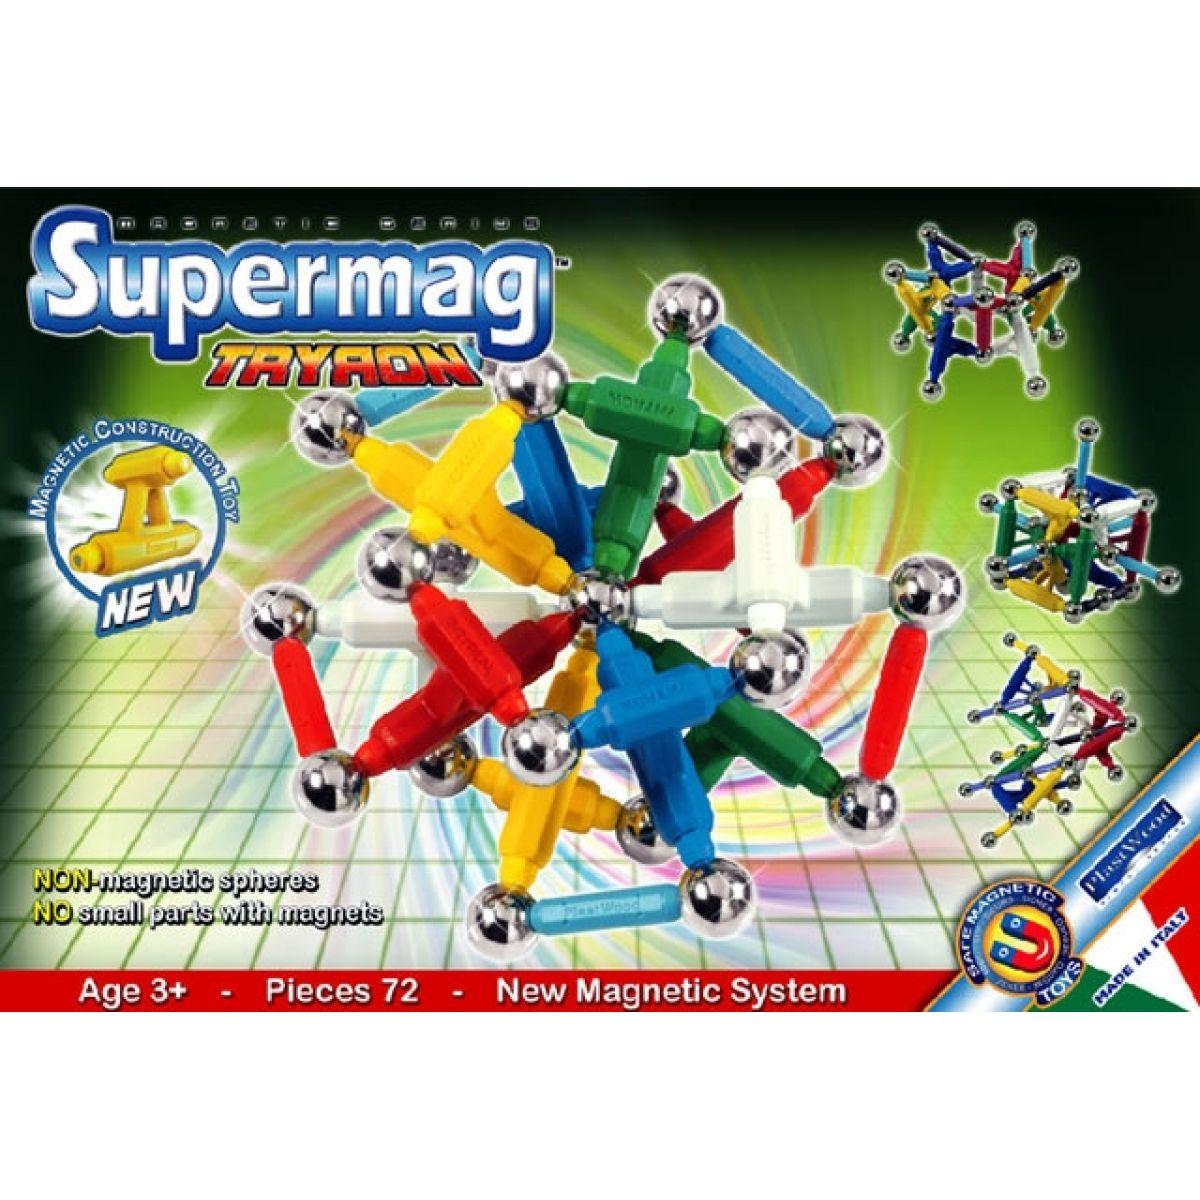 Supermag 0569 - Supermag TRYRON 72 dílků, zelený